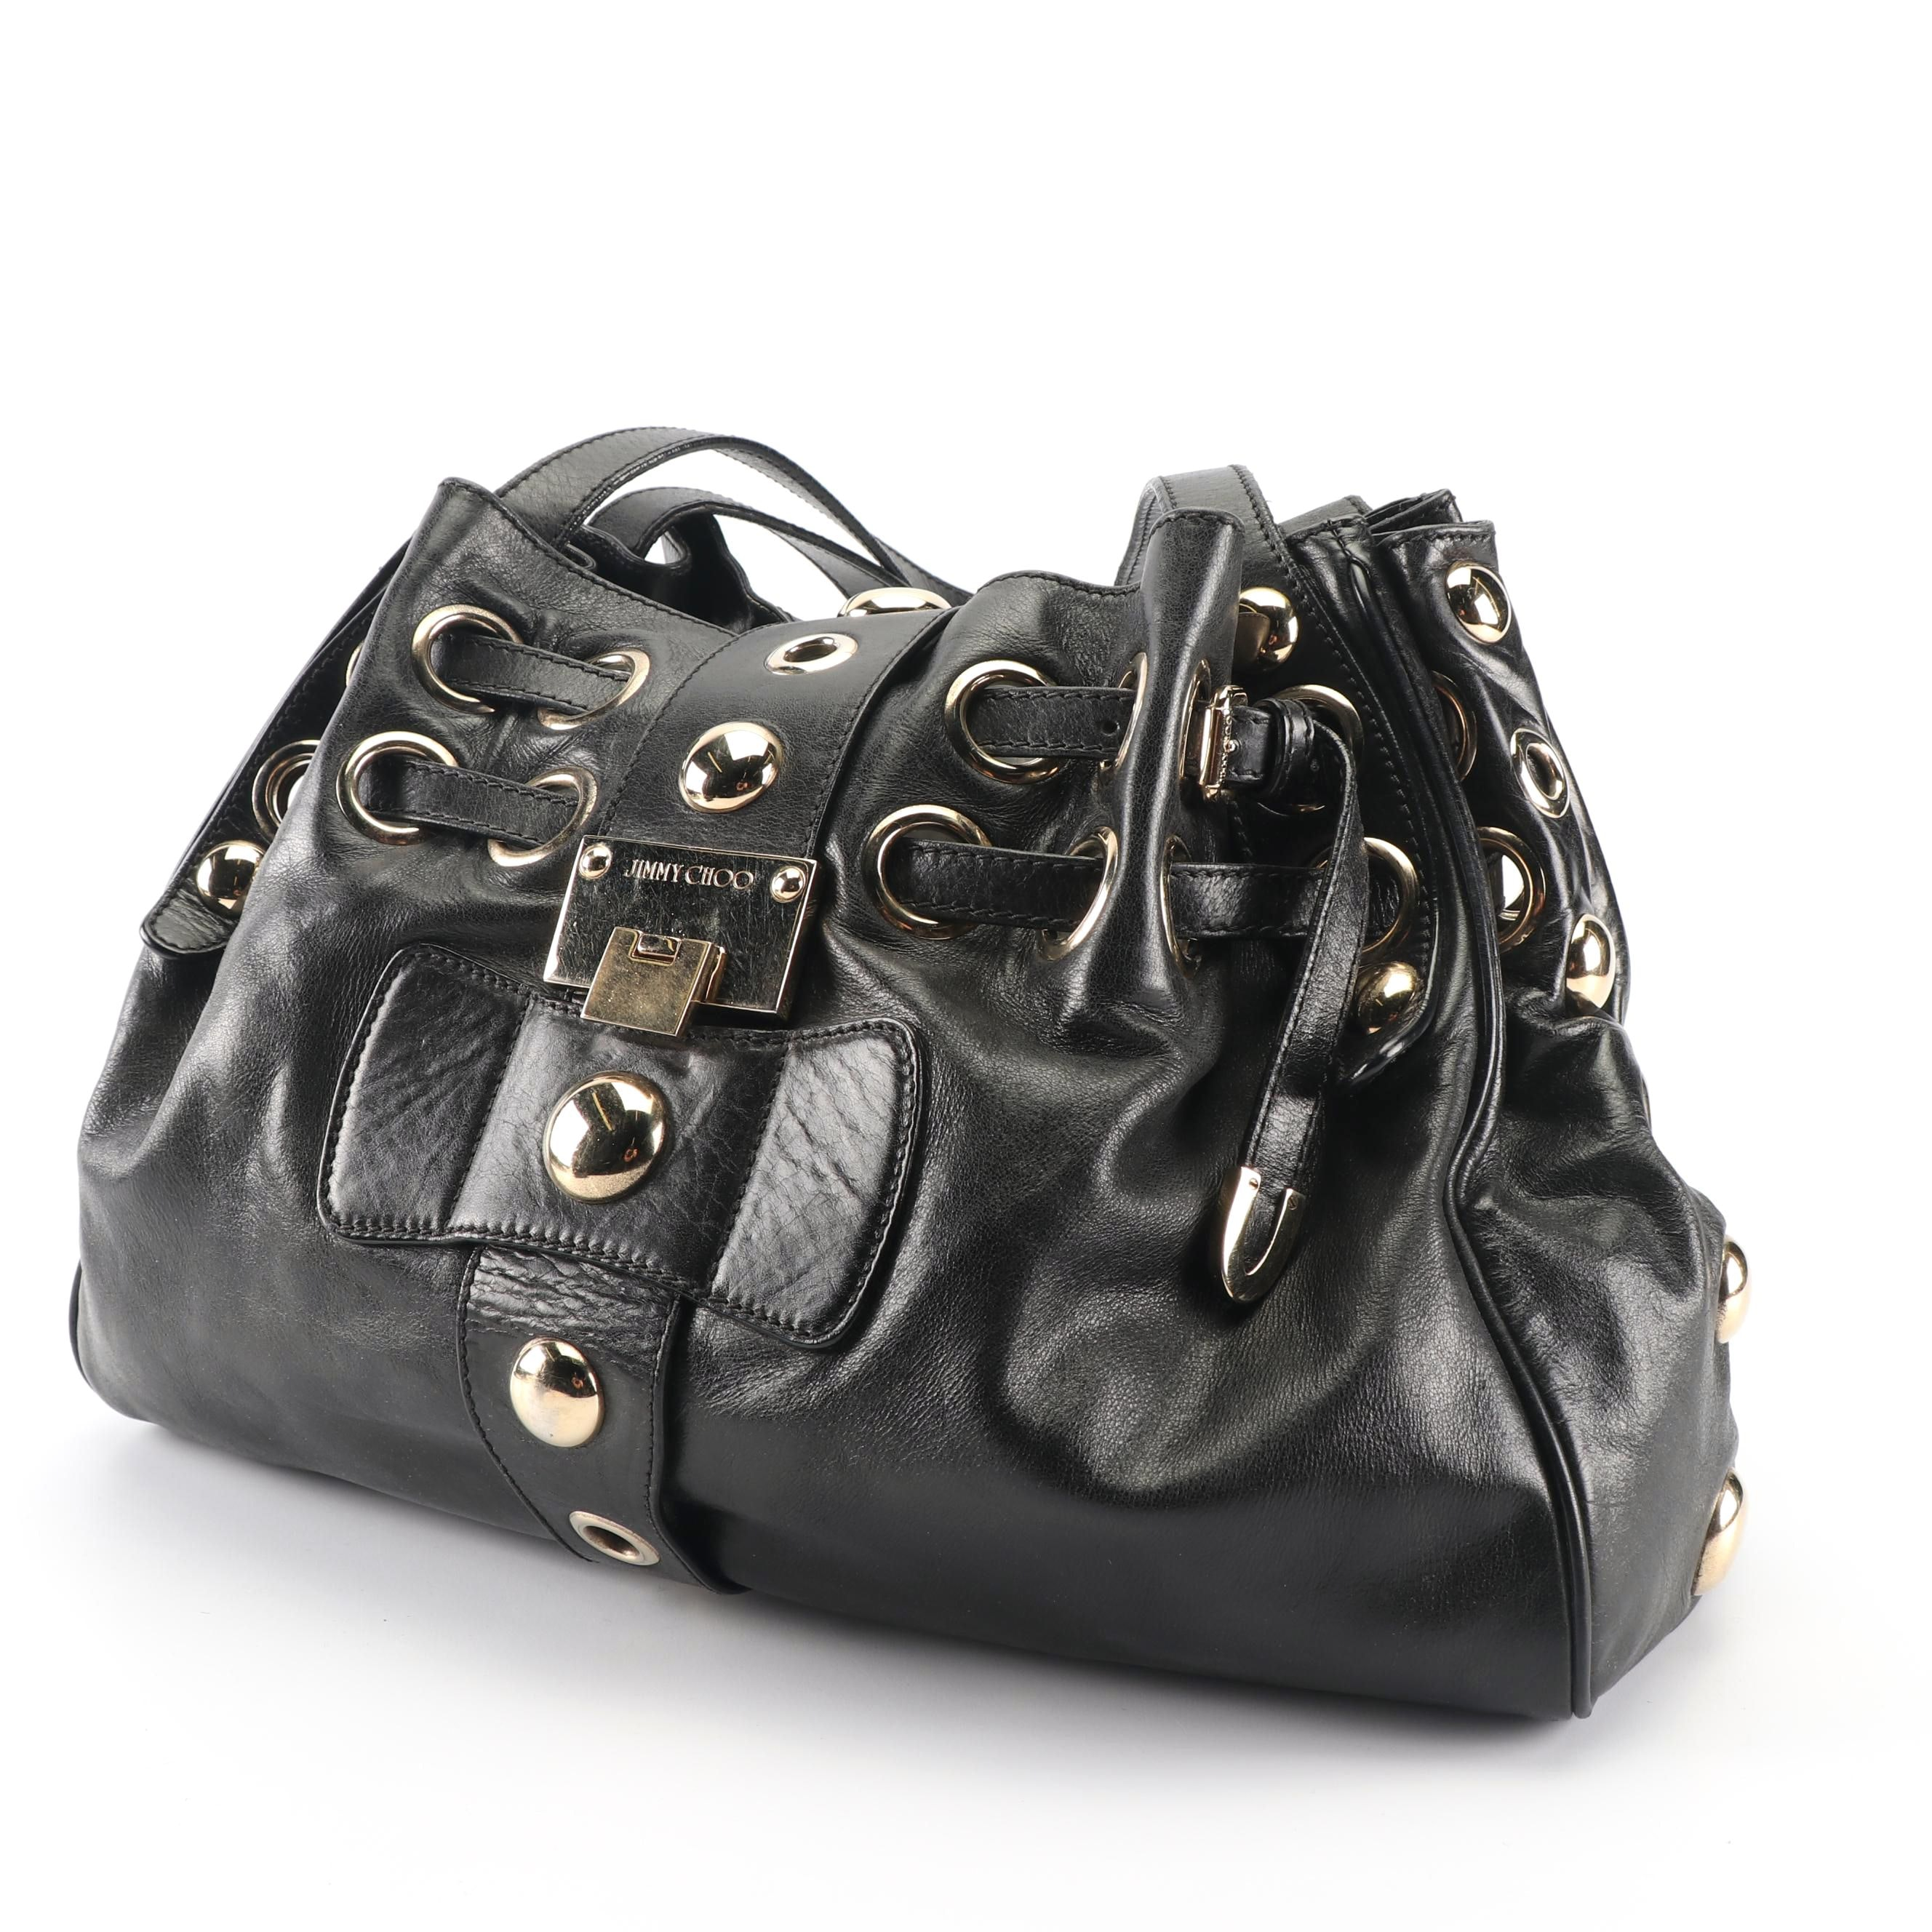 Jimmy Choo Black Leather Large Stud and Grommet Accented Handbag